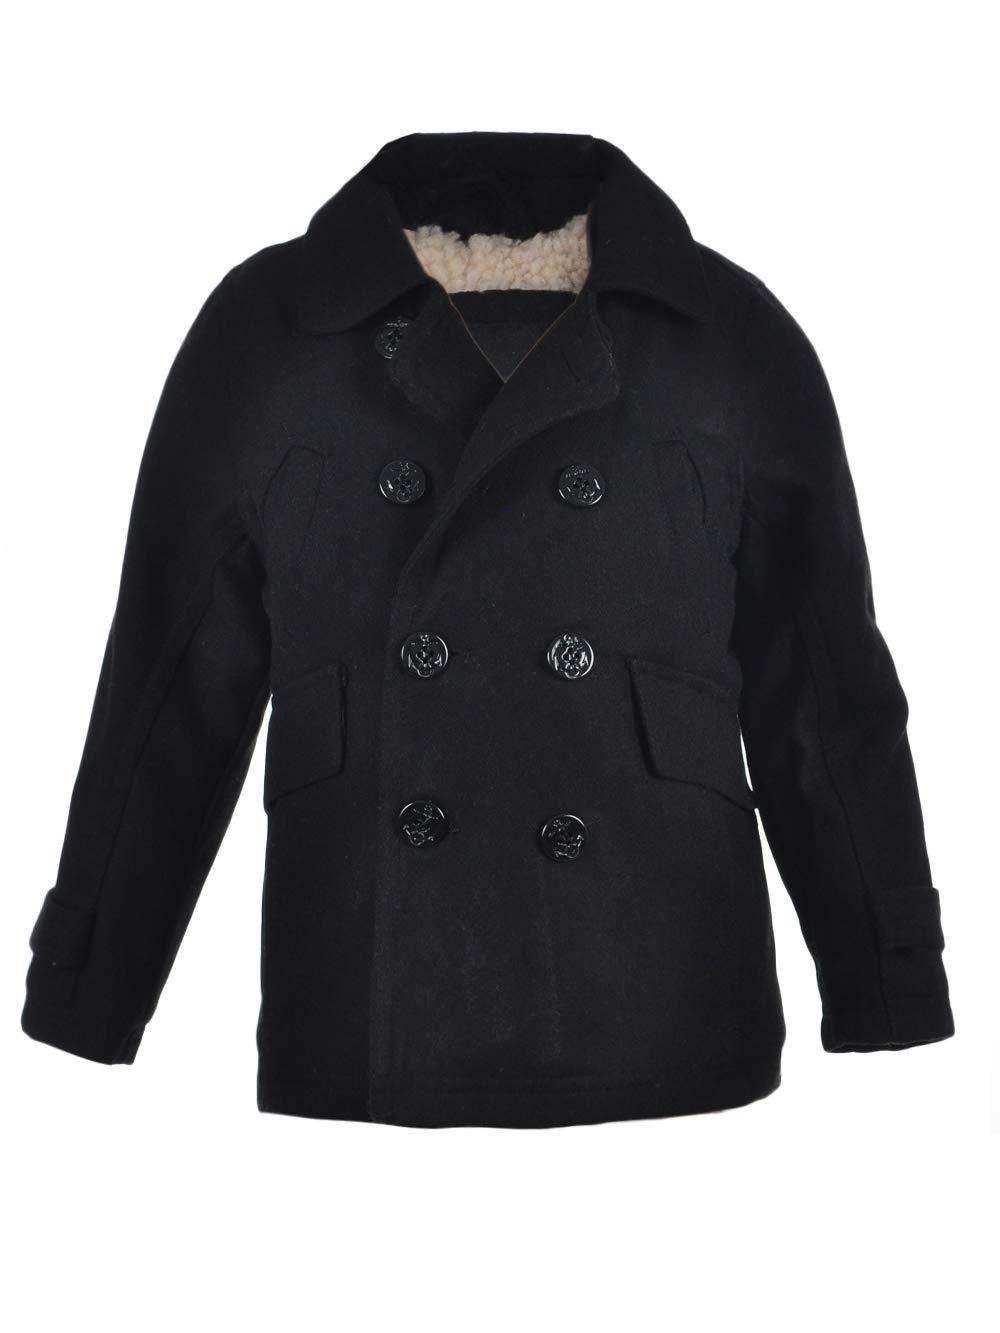 Urban Republic Big Boys' Wool Peacoat - Black, 10-12 by Urban Republic (Image #1)